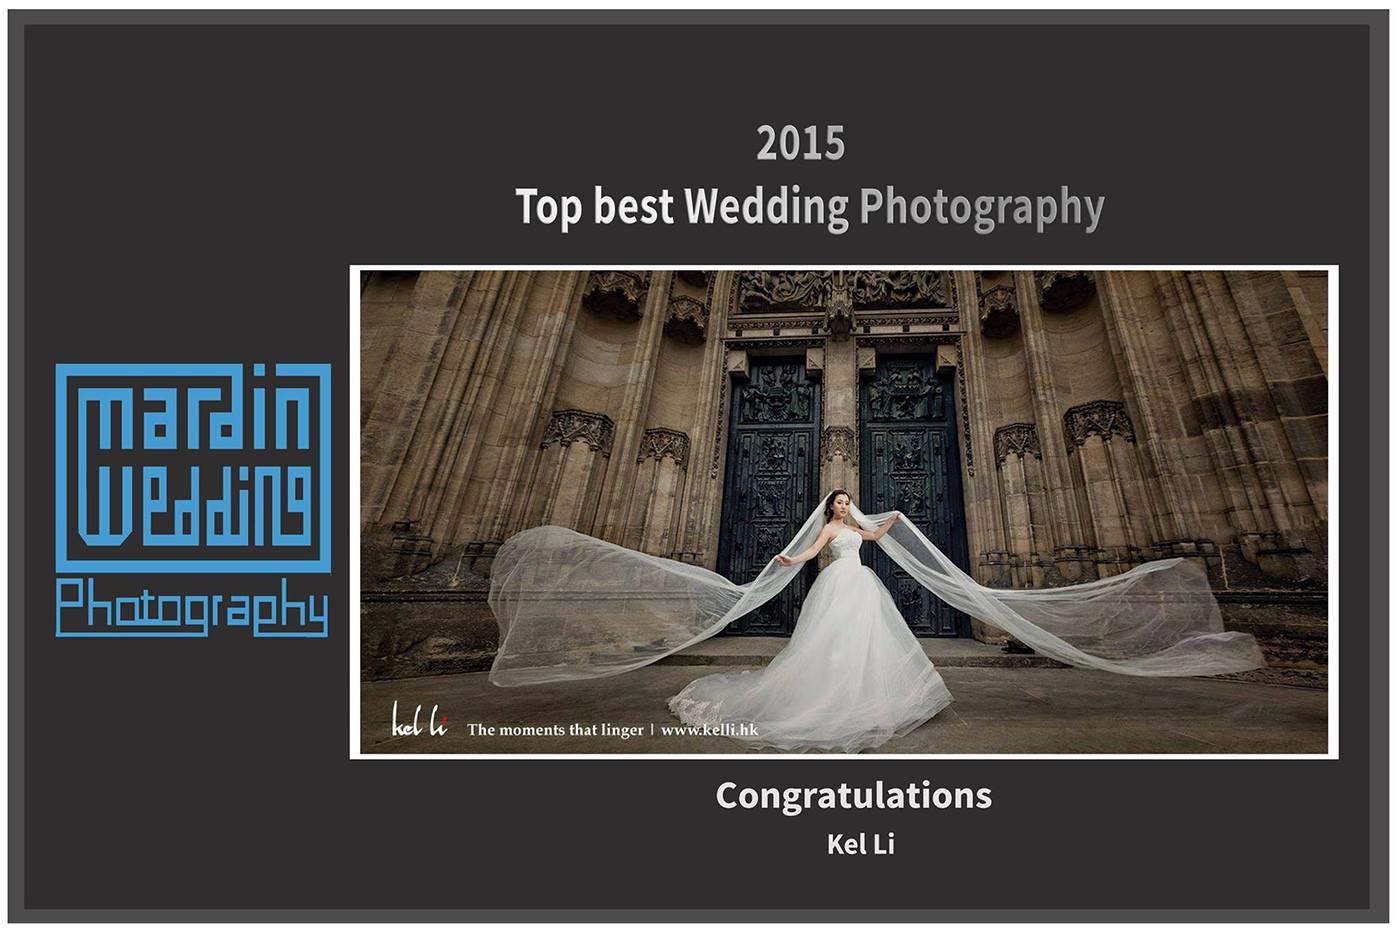 剛收到2015 Best Wedding Photography獎項